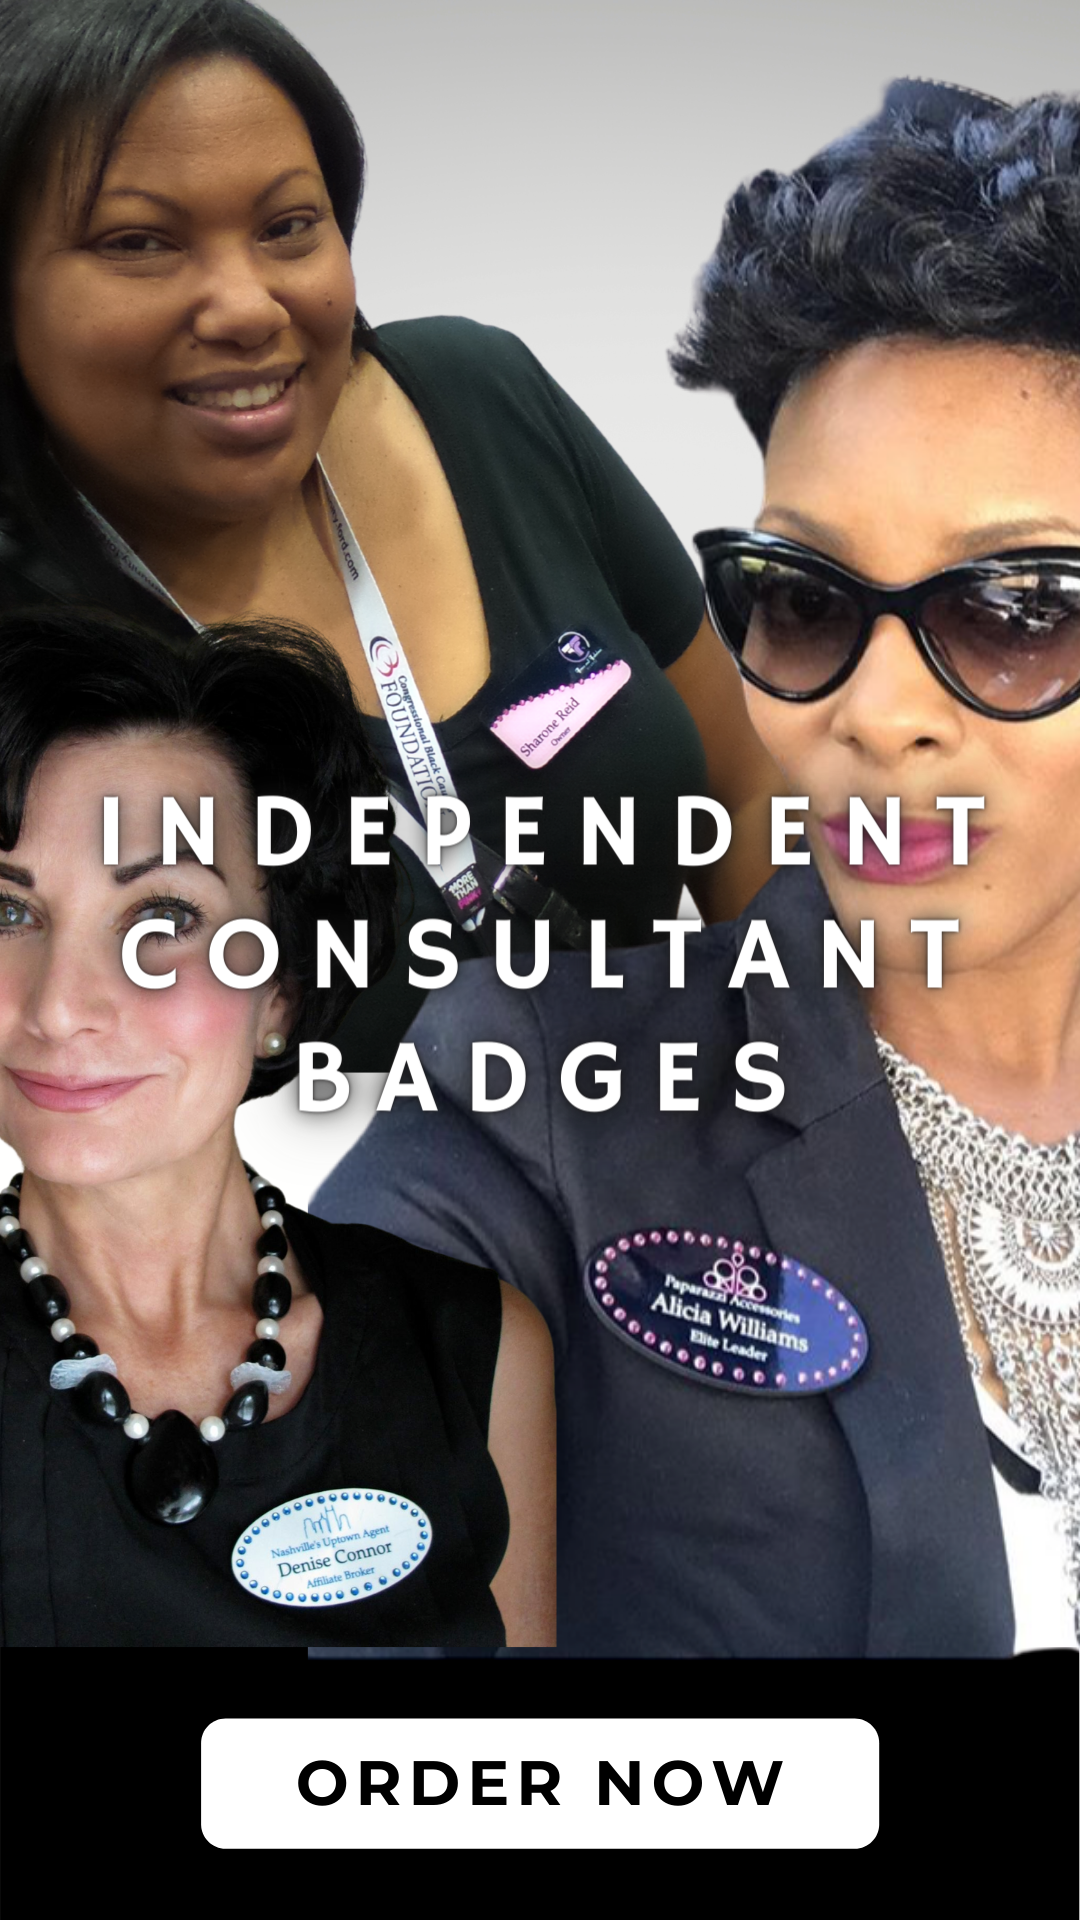 Independent Consultant